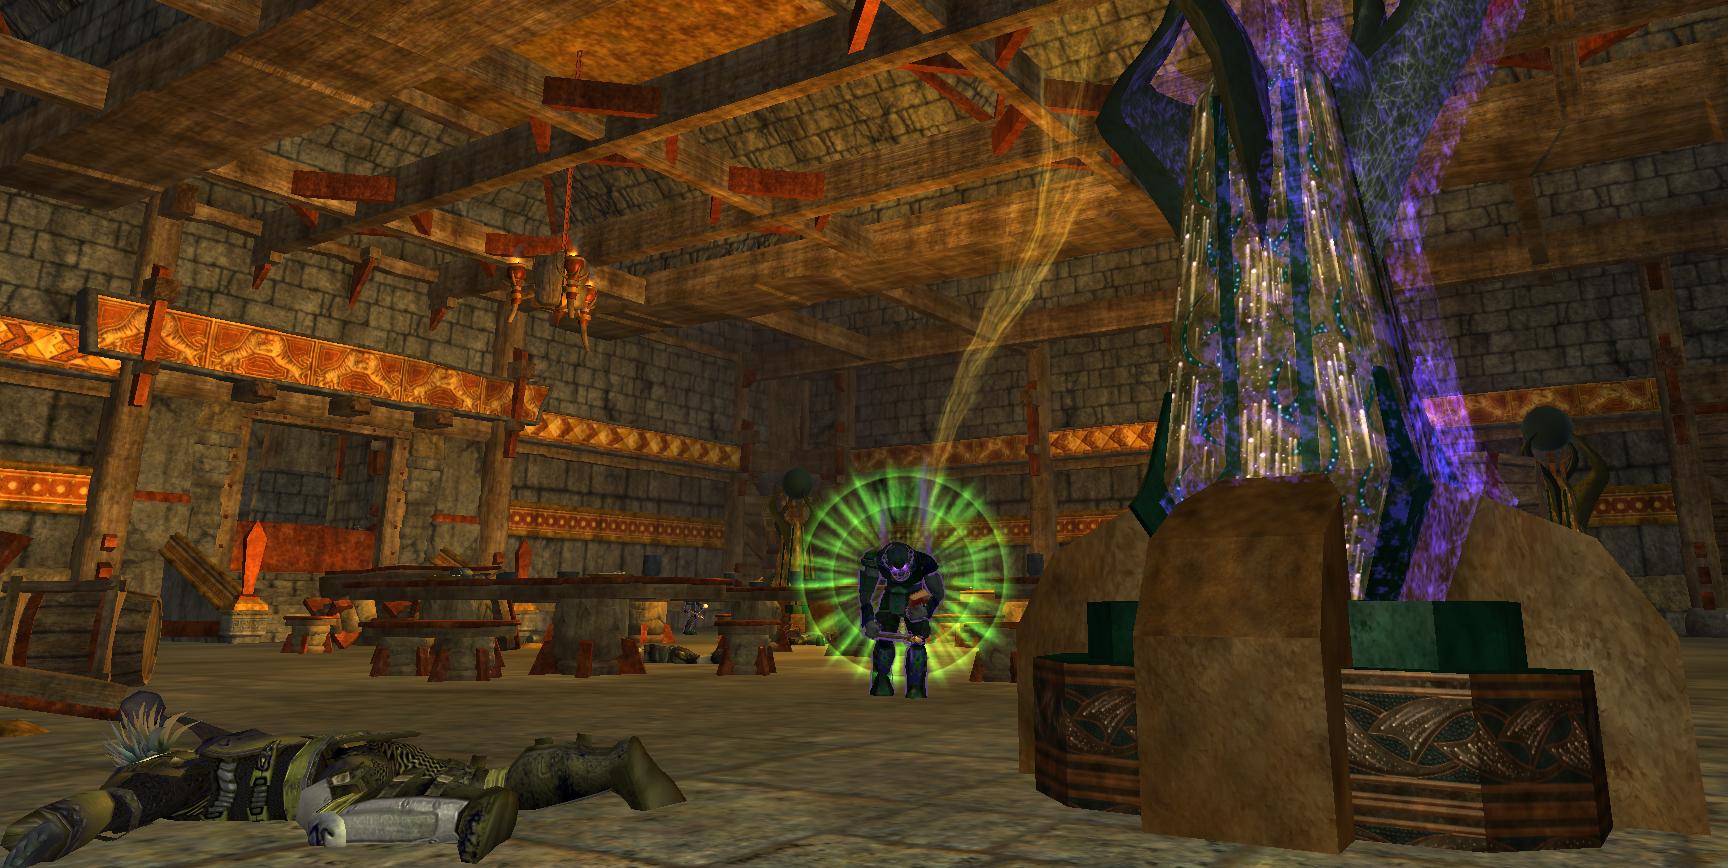 EverQuest II - News - Expansion Prelude Event: Strange